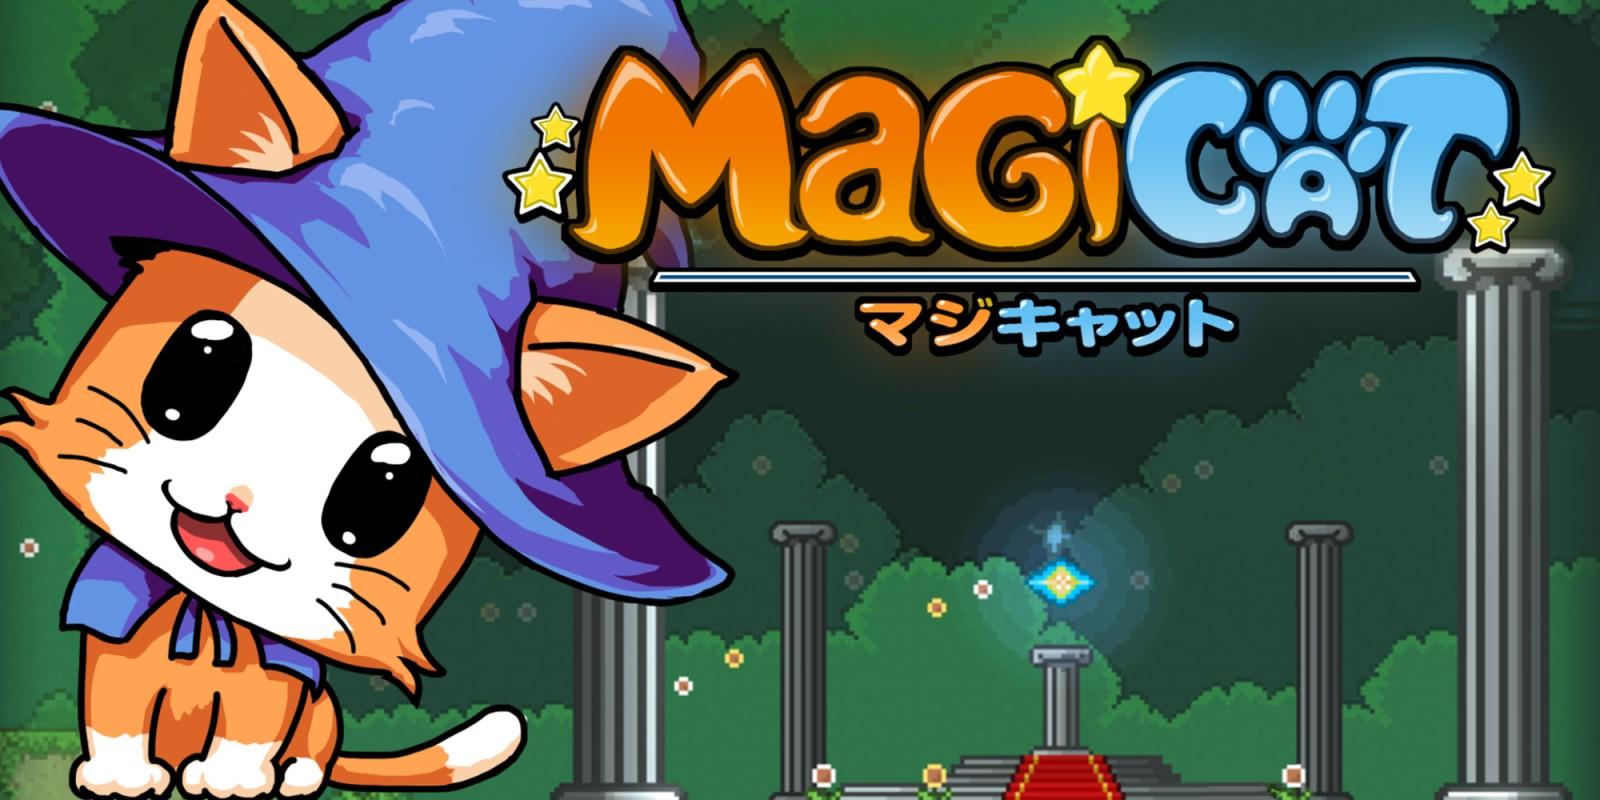 H2x1_NSwitchDS_MagiCat_image1600w.jpg